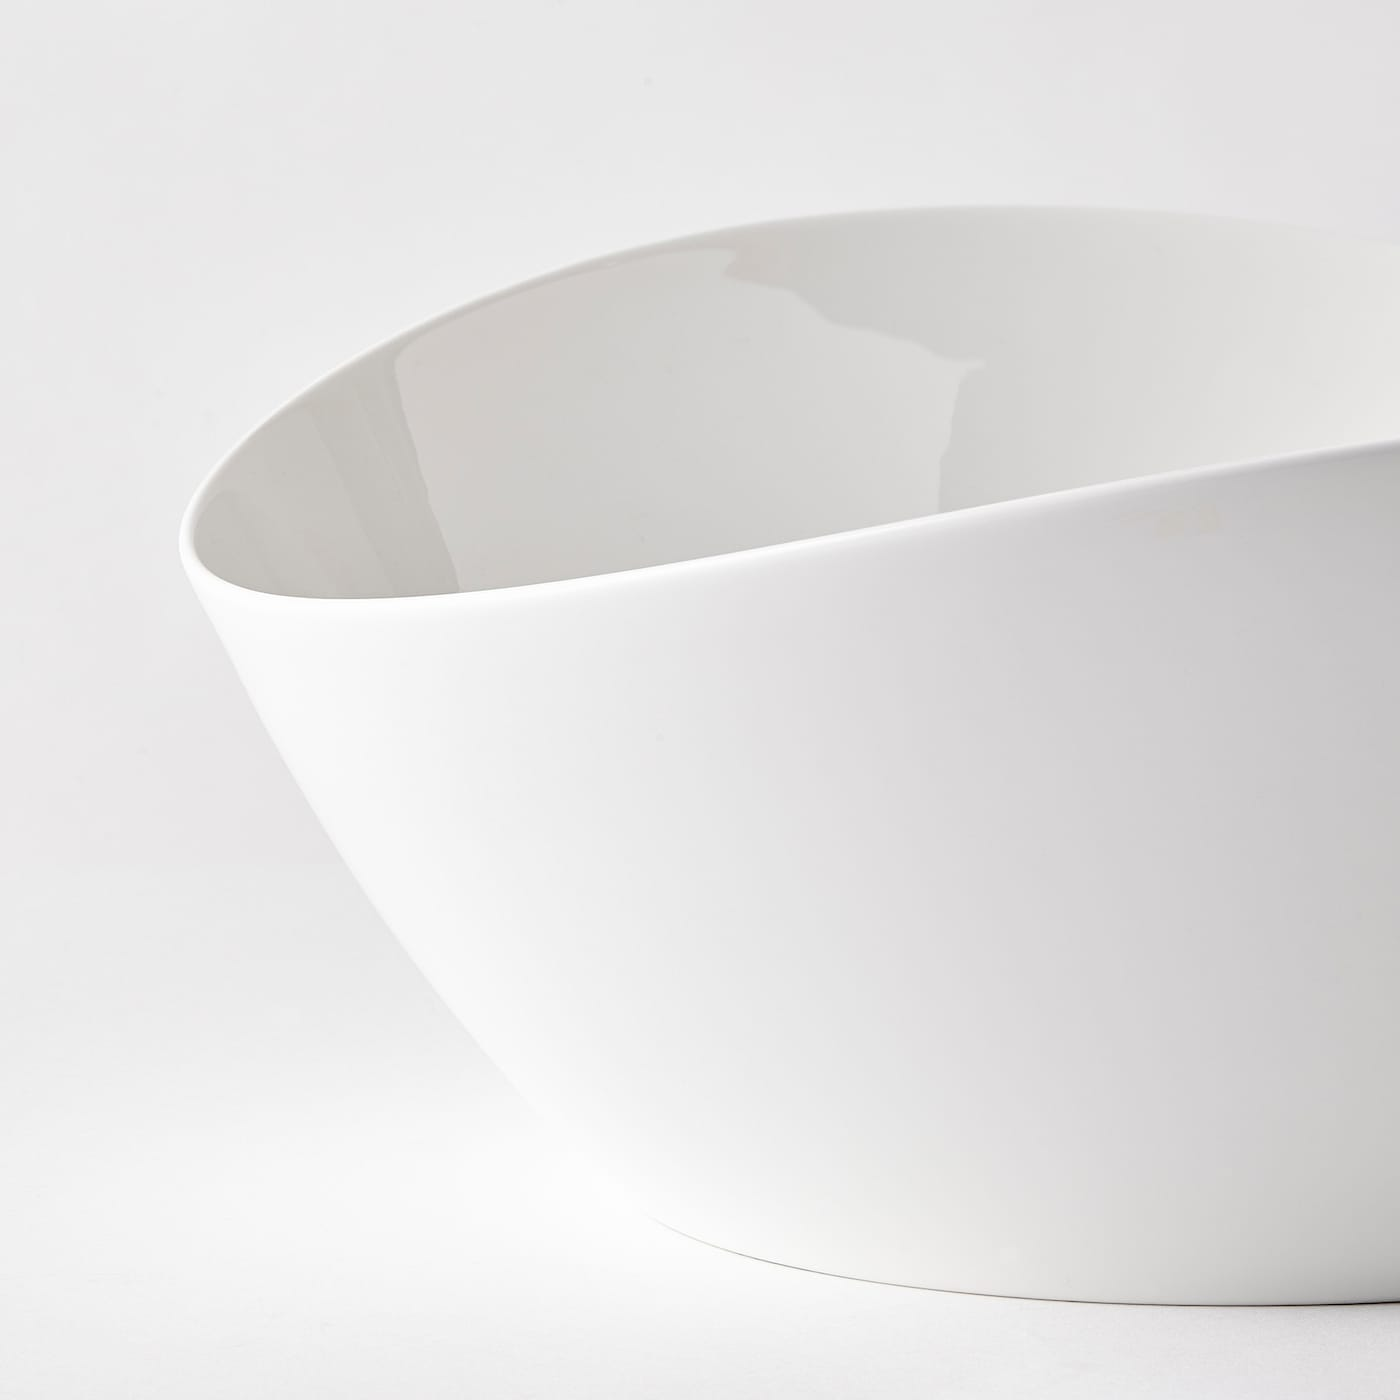 SKYN Serving bowl, white, 31 cm